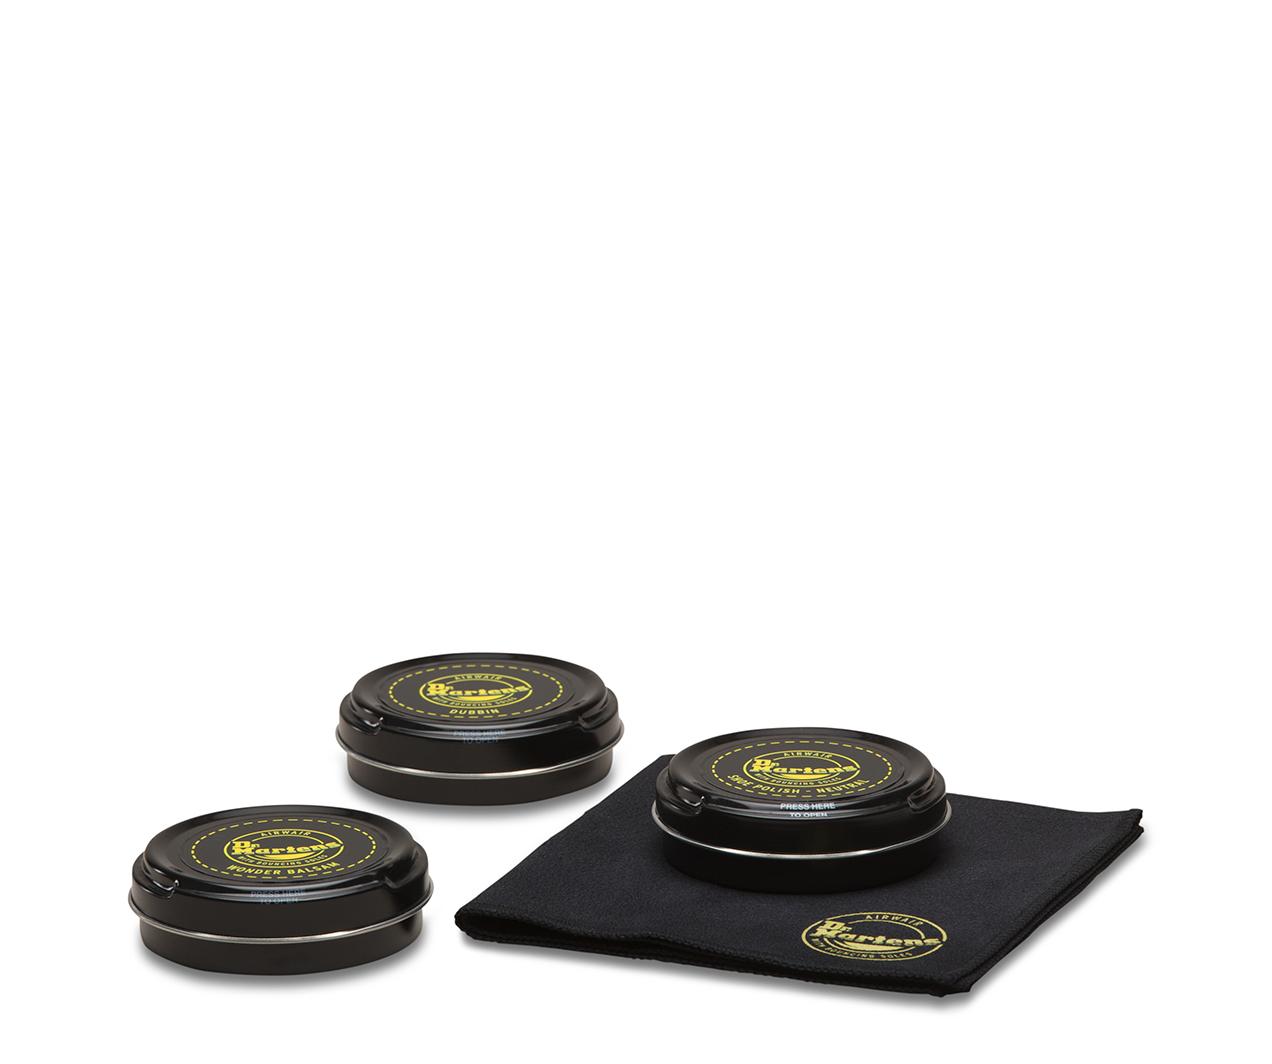 Martens Shoe Care Kit 2 AC774000 Wonder Balsam Dubbin Shoe Polish w// Cloth Dr